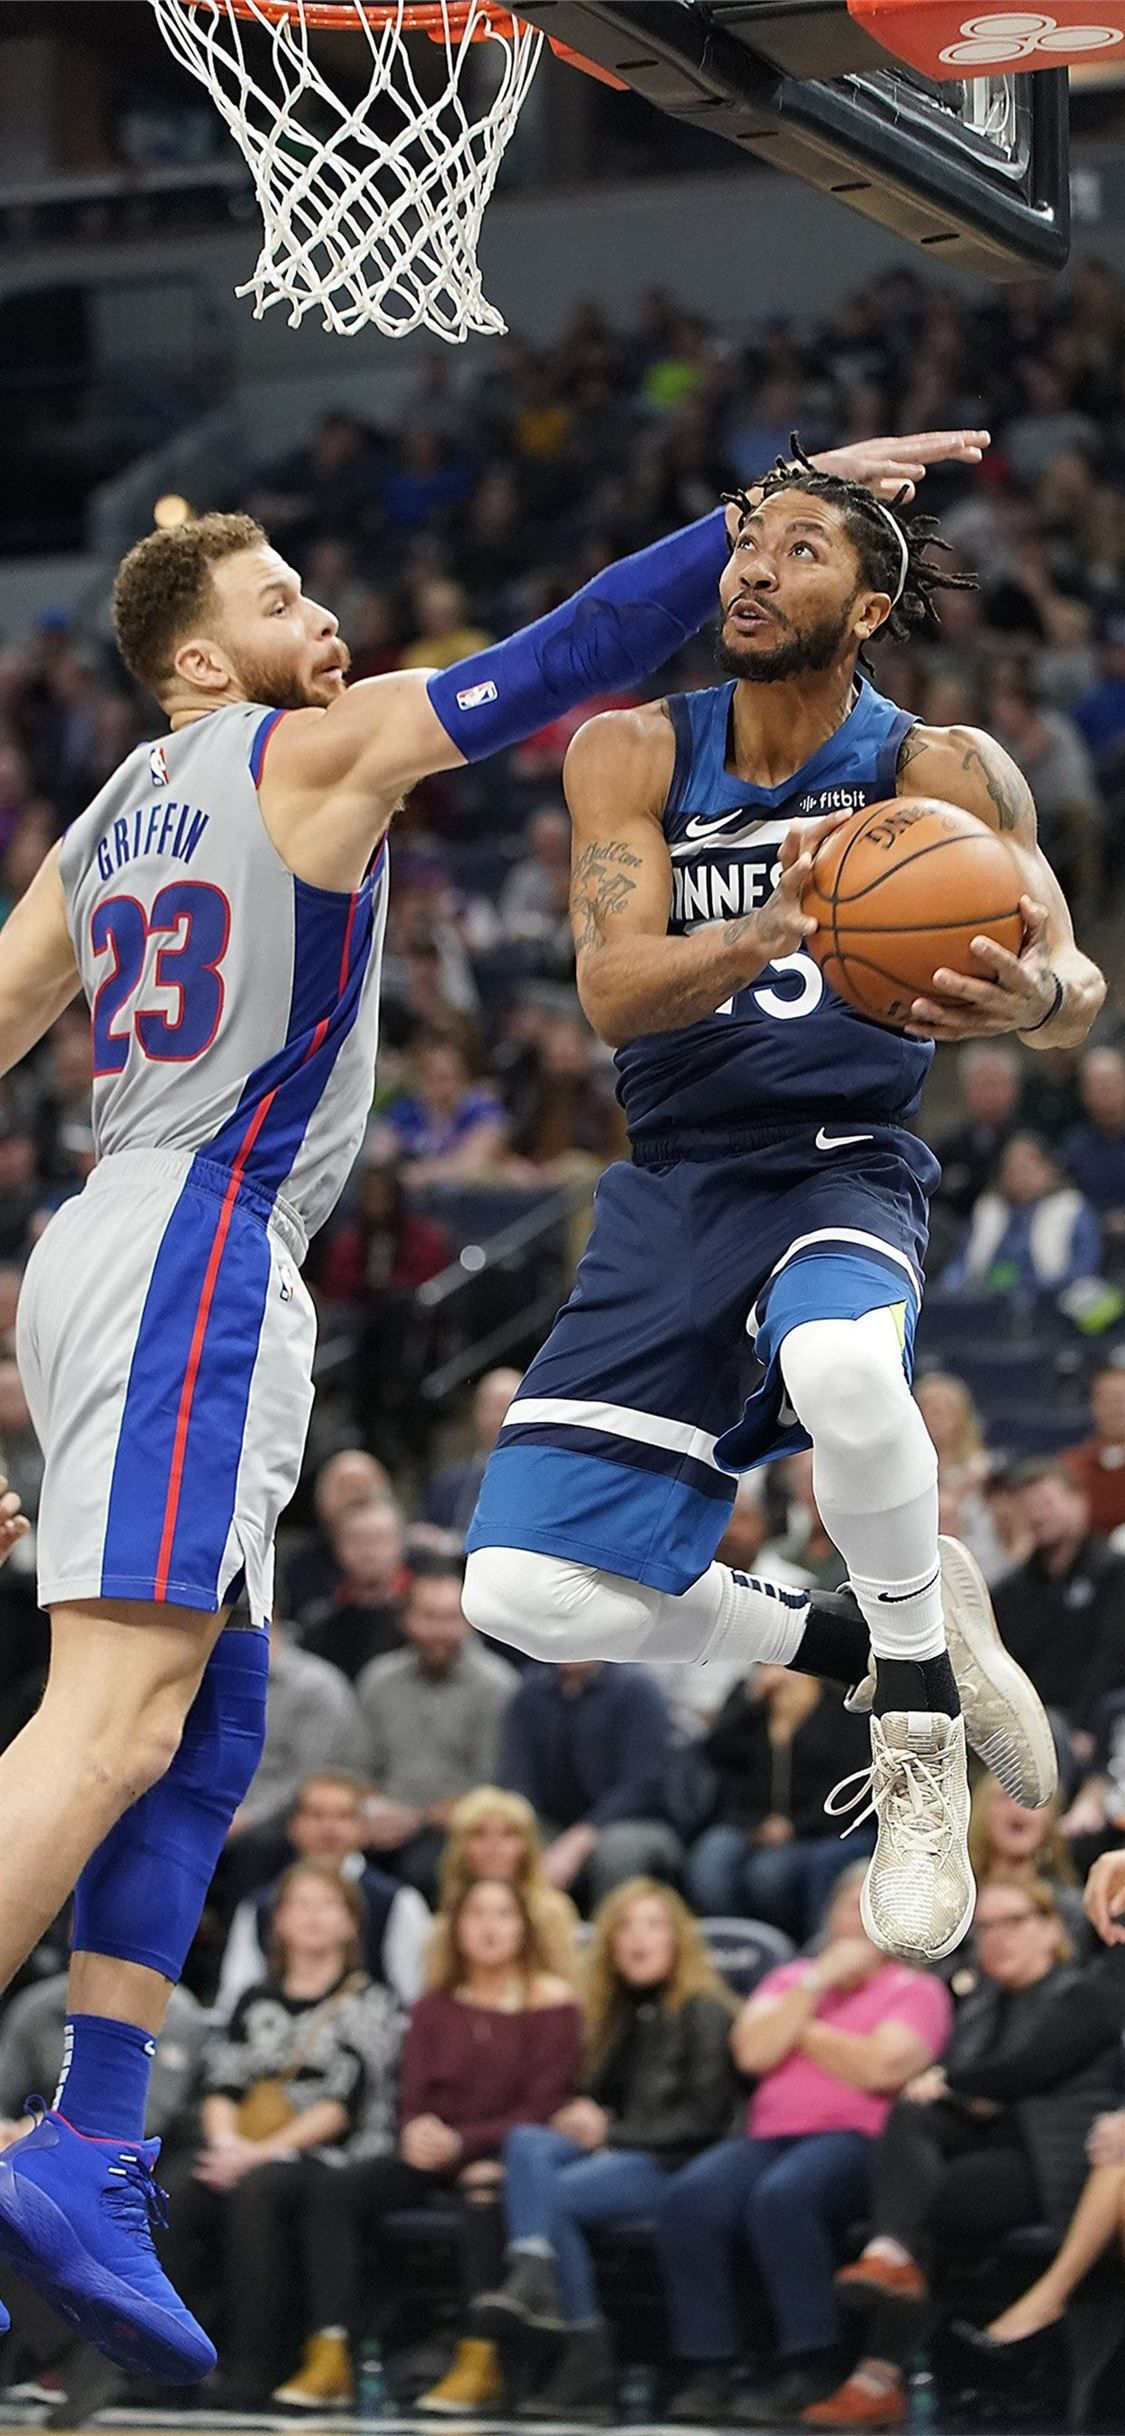 Nba Free Agency Derrick Rose Leaves Timberwolves F Derrickrose Sportcelebrity Basketballcelebrity Unitedstat In 2020 Derrick Rose Sports Celebrities Rose Leaves